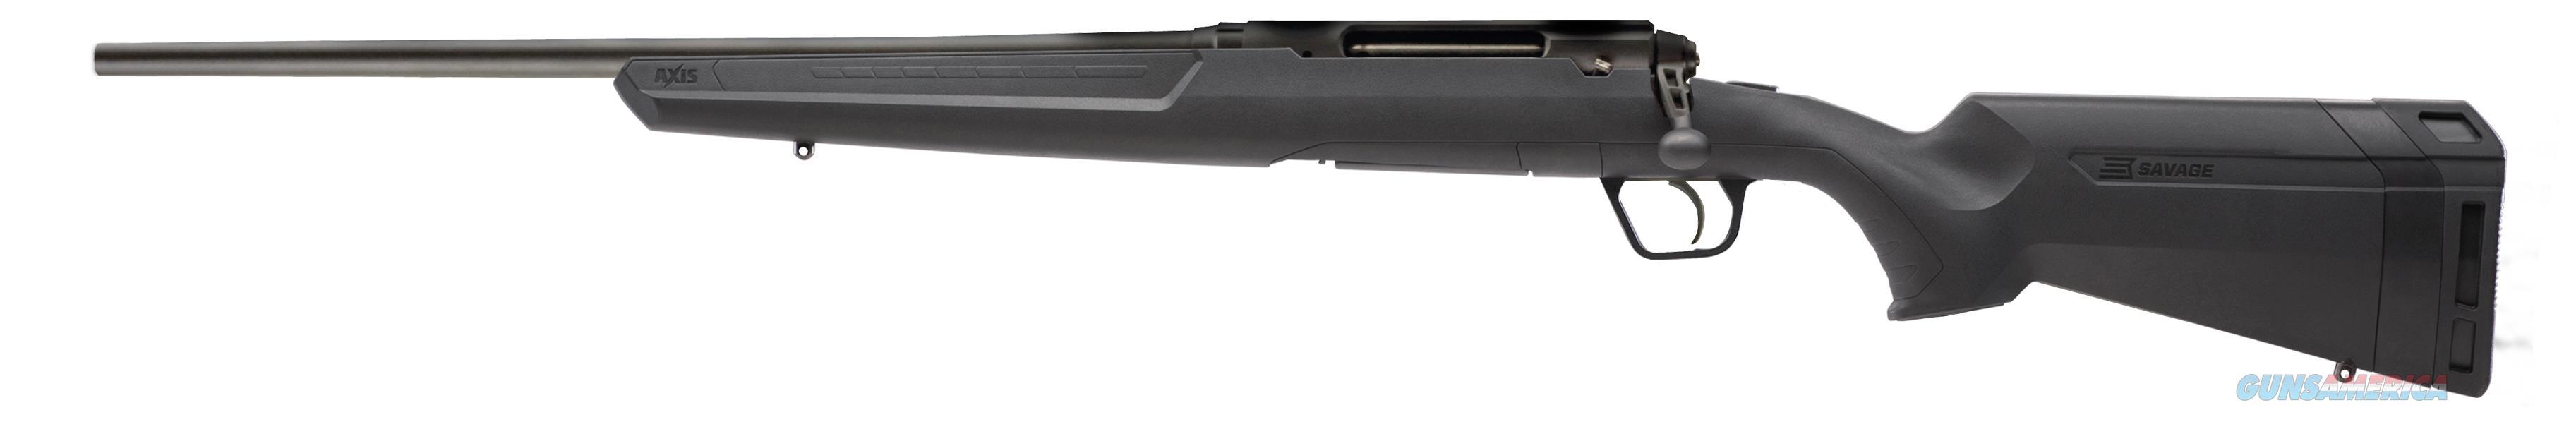 "Savage 57243 Axis Compact LH Bolt 7mm-08 Remington 20"" 4+1 Synthetic Black Stk Blued  Guns > Rifles > S Misc Rifles"